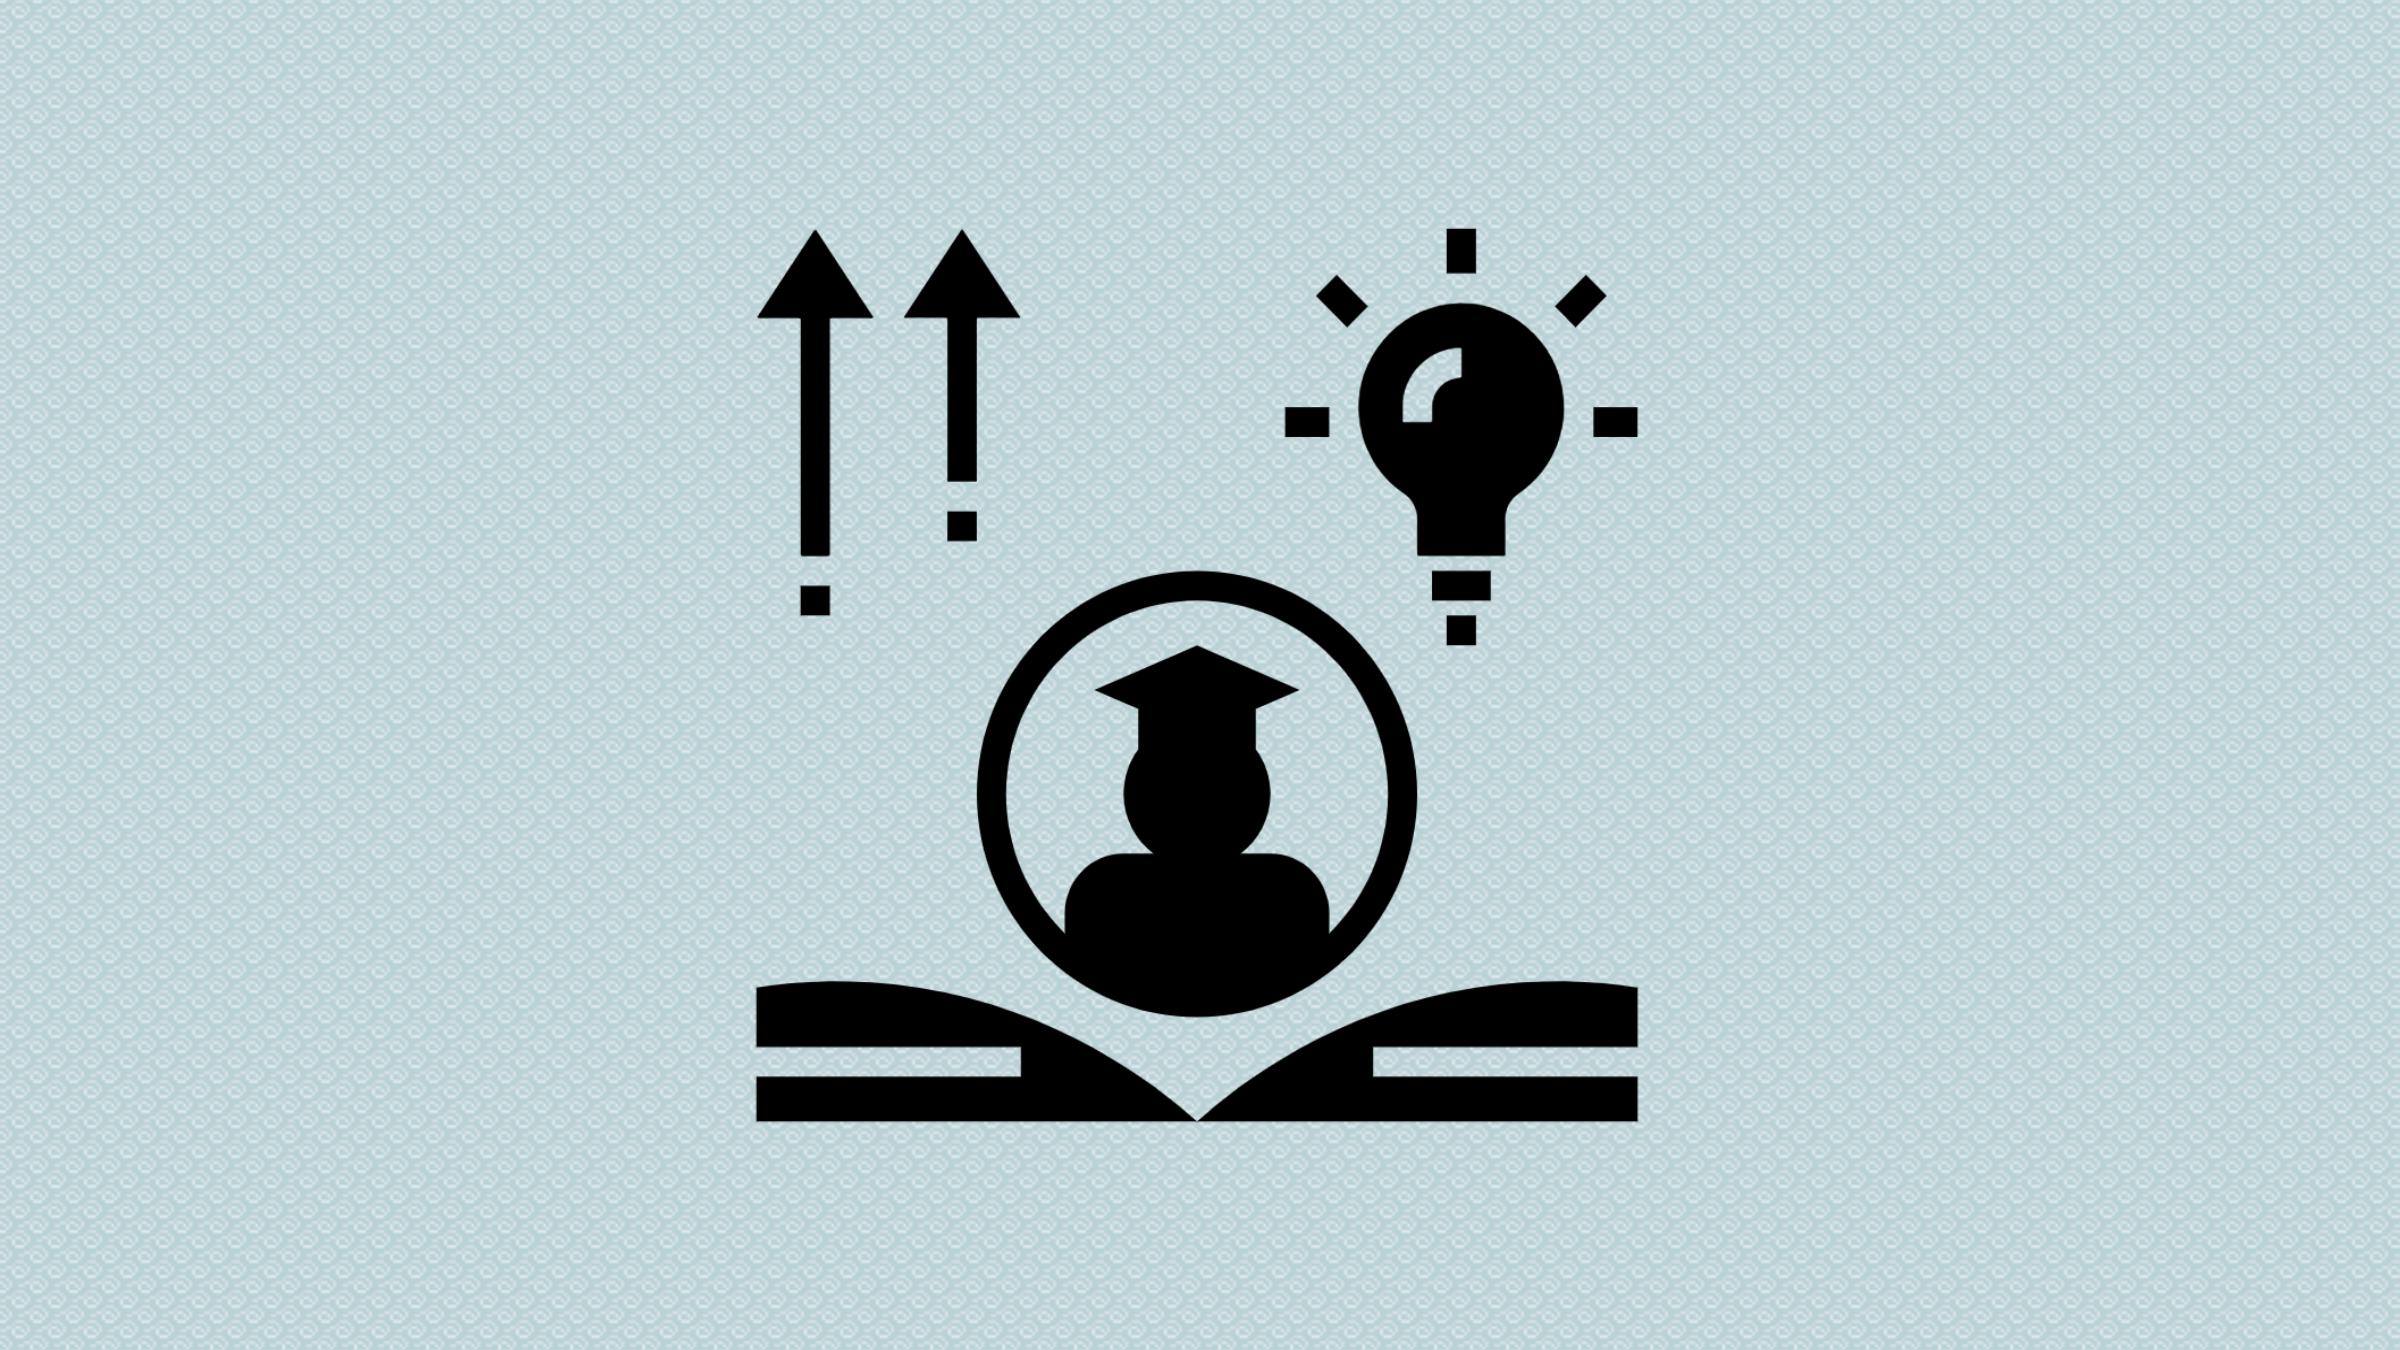 Scholar icon. Image credit: The Noun Project